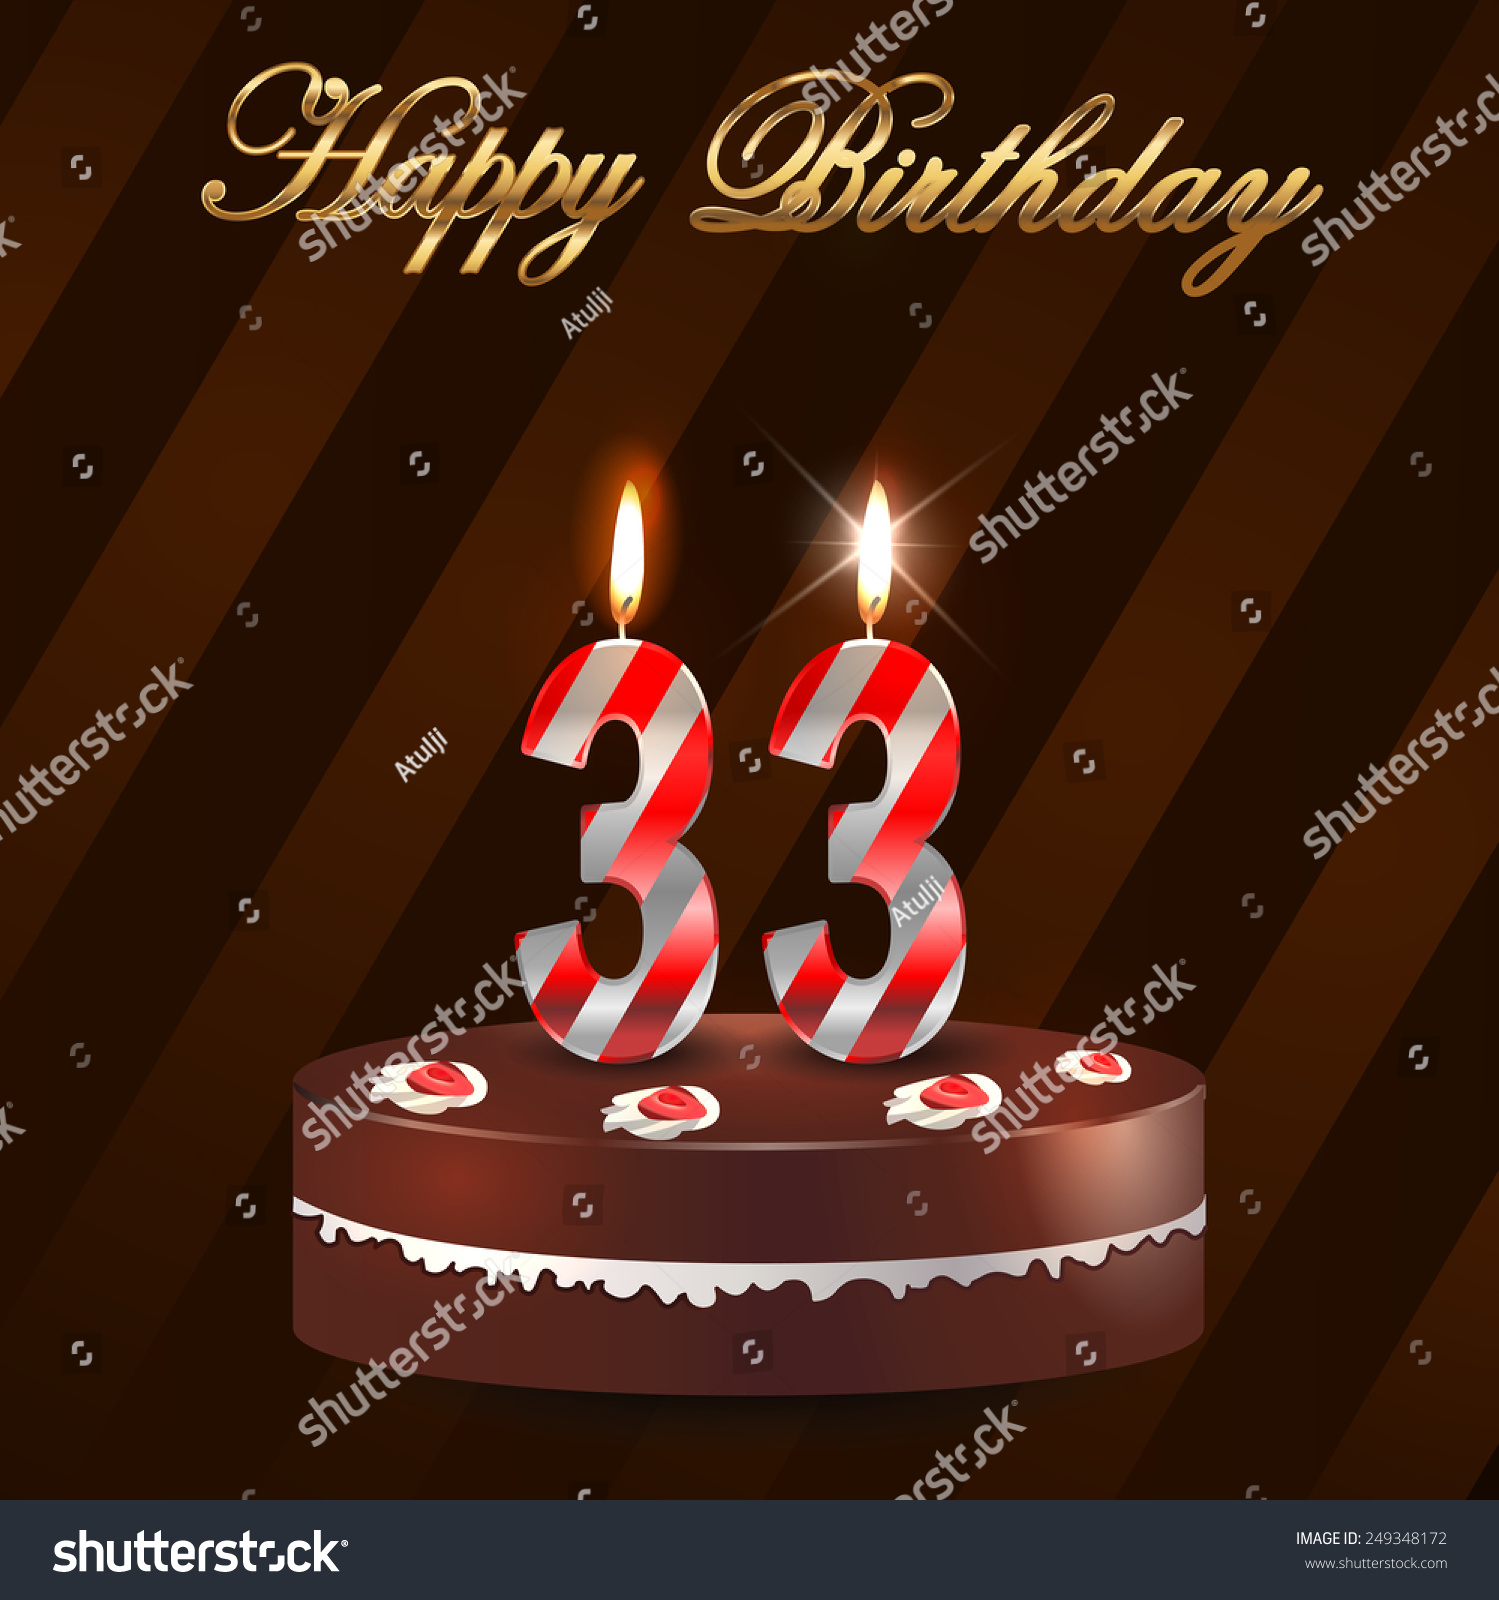 Happy 33rd Birthday Cake